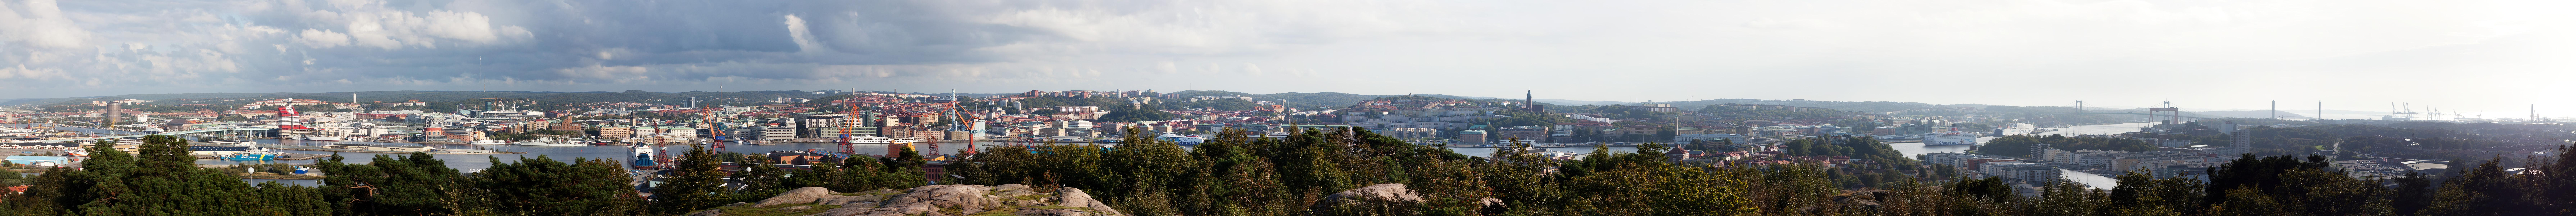 prostituerade i danmark prostituerade göteborg